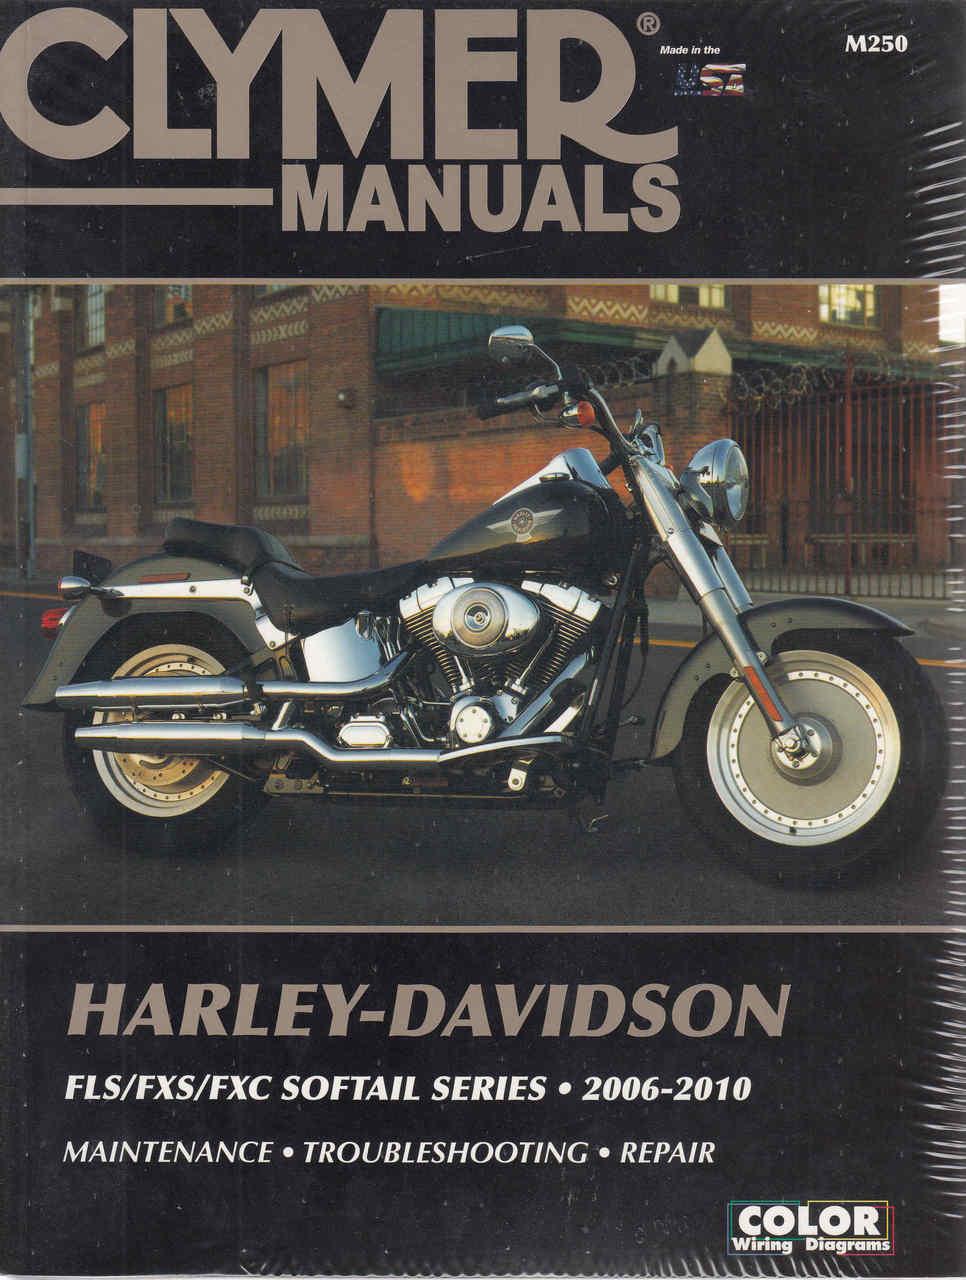 harley davidson fls fxs fxc softail series 2006 2009 workshop manual rh automotobookshop com au 2010 fxdb owners manual 2010 fxdb owners manual